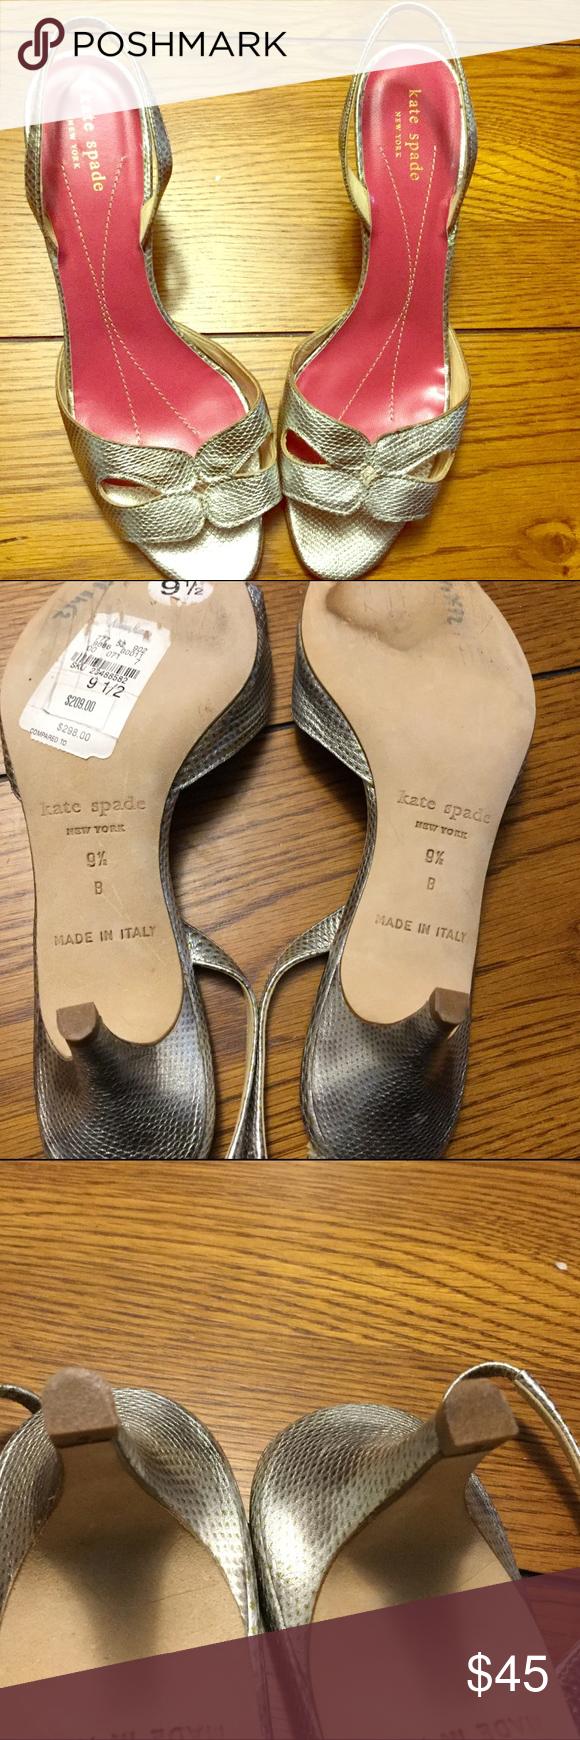 Kate Spade Slingback Kitten Heel Sandals Silver, in great shape. Very Pretty !!! kate spade Shoes Sandals